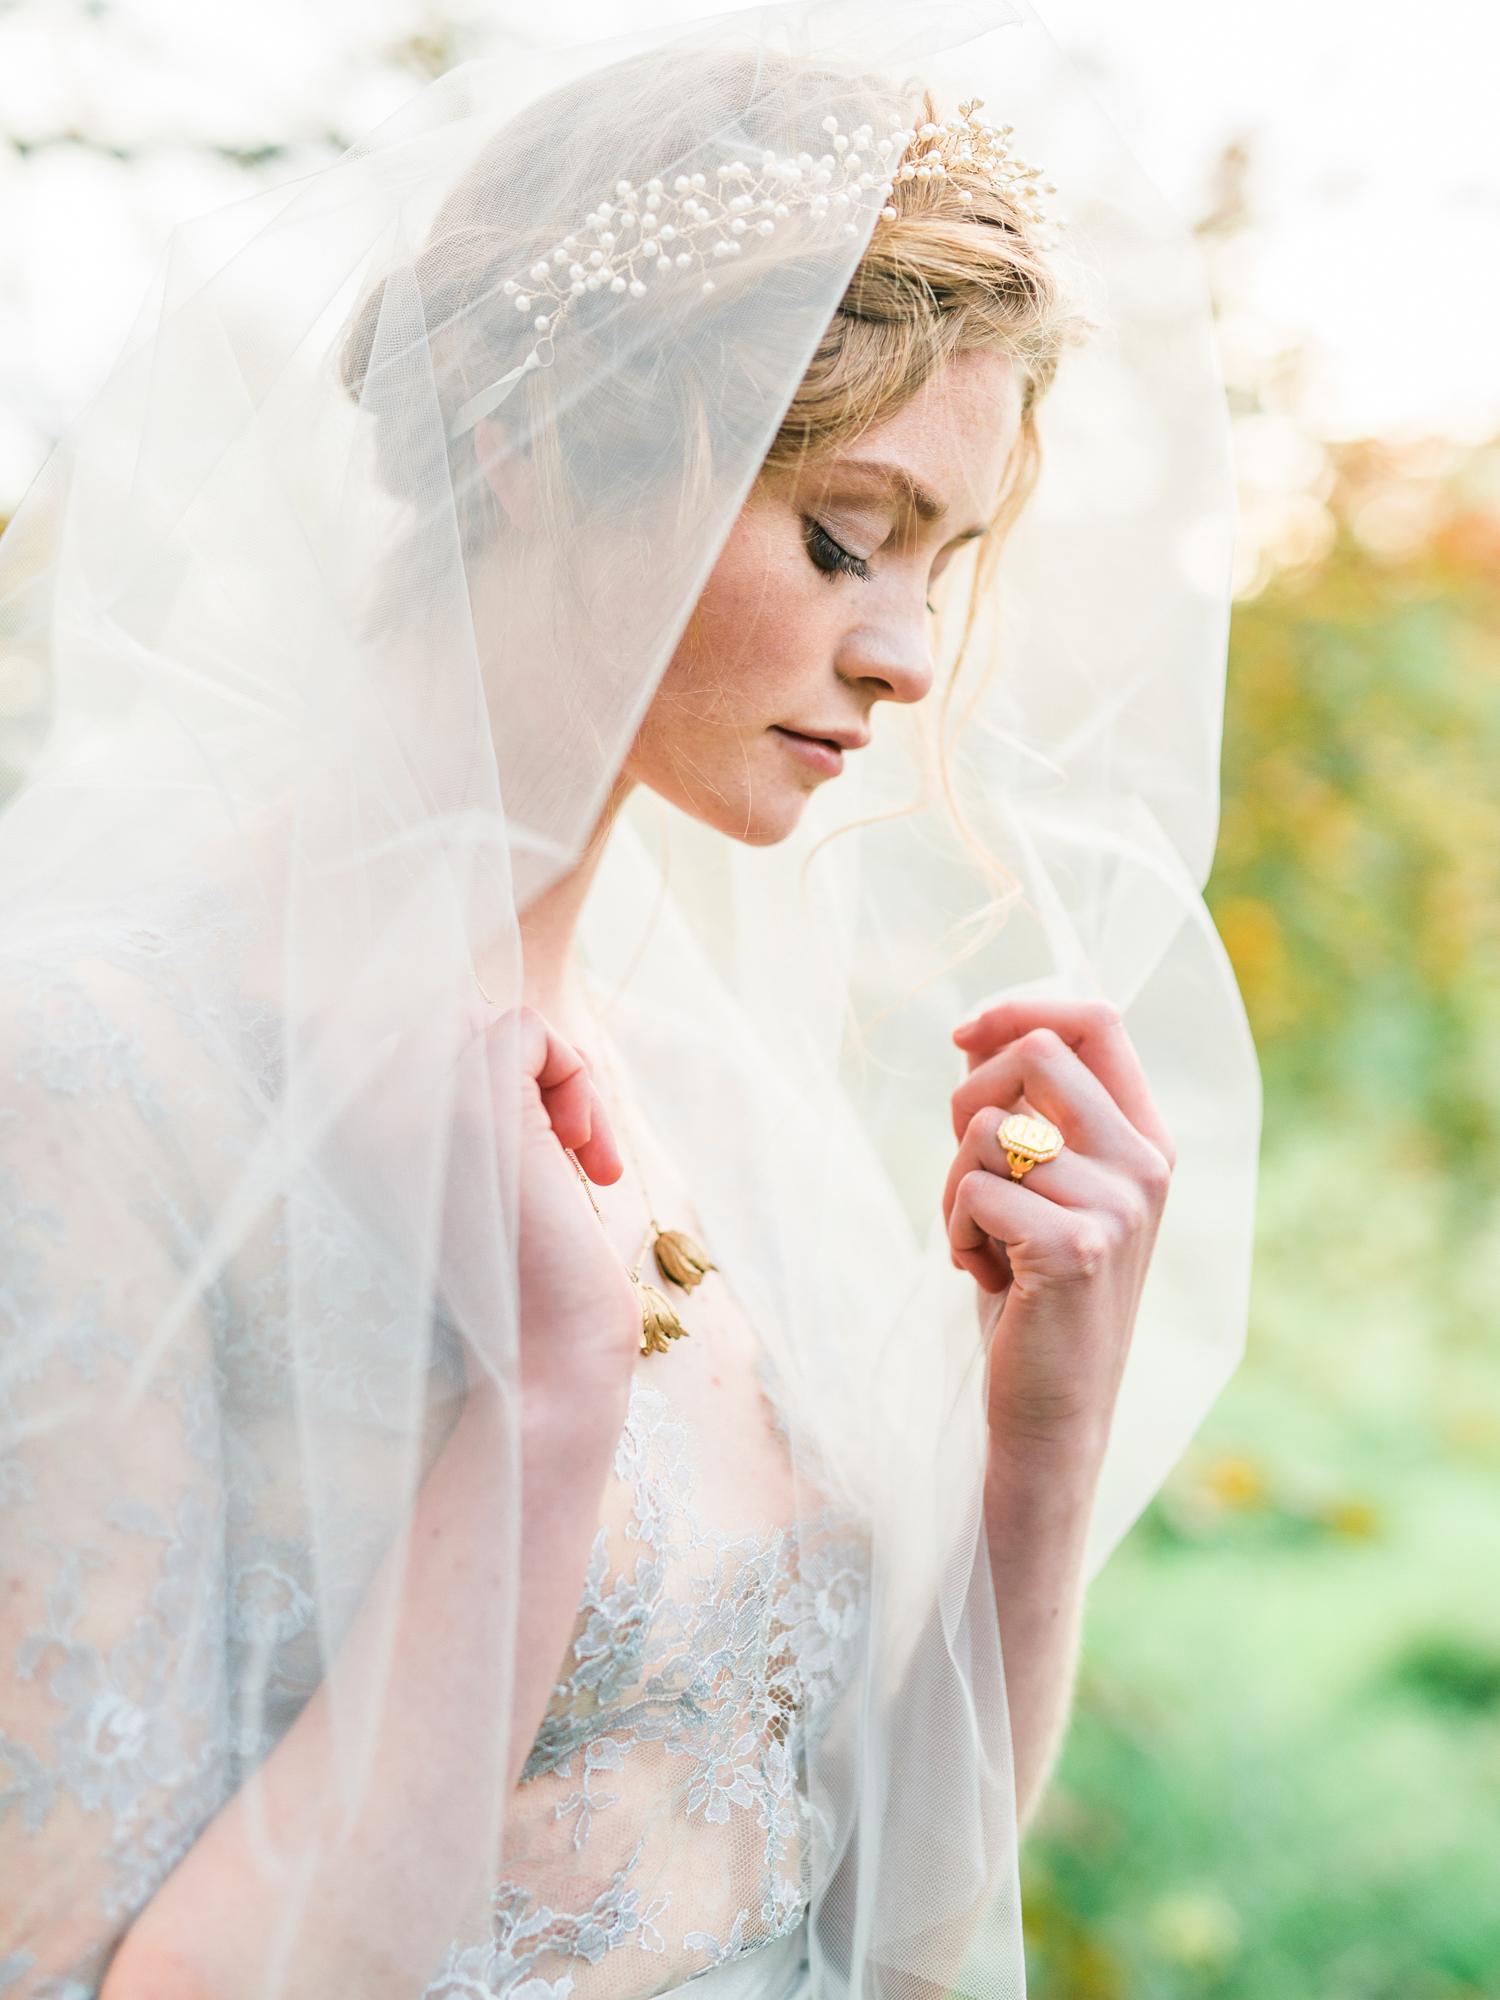 Destination Wedding Photographer _ wedding photography _ film photography _ europe wedding photographer _ love is my favorite color_-15.jpg